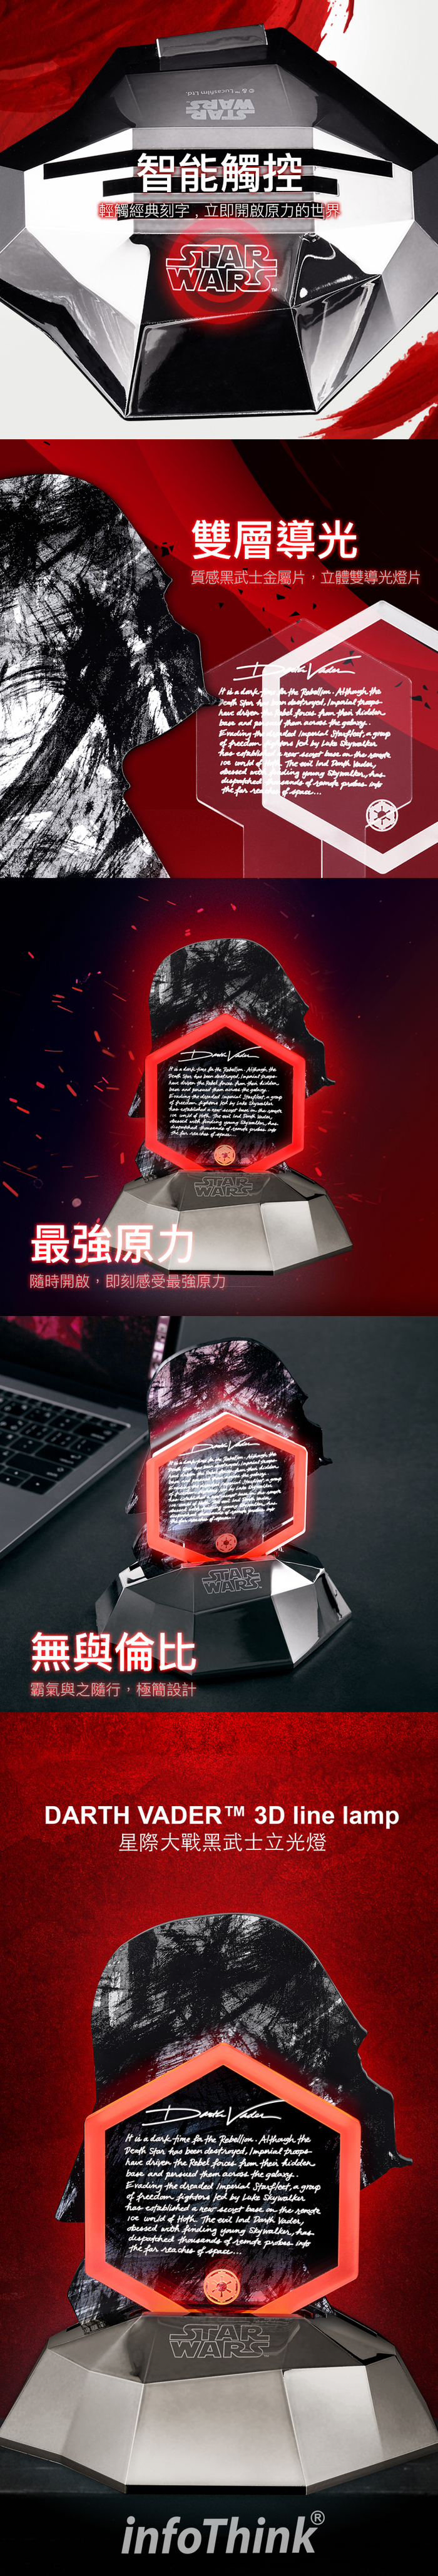 InfoThink|(限量收藏版)星際大戰黑武士3D立光燈